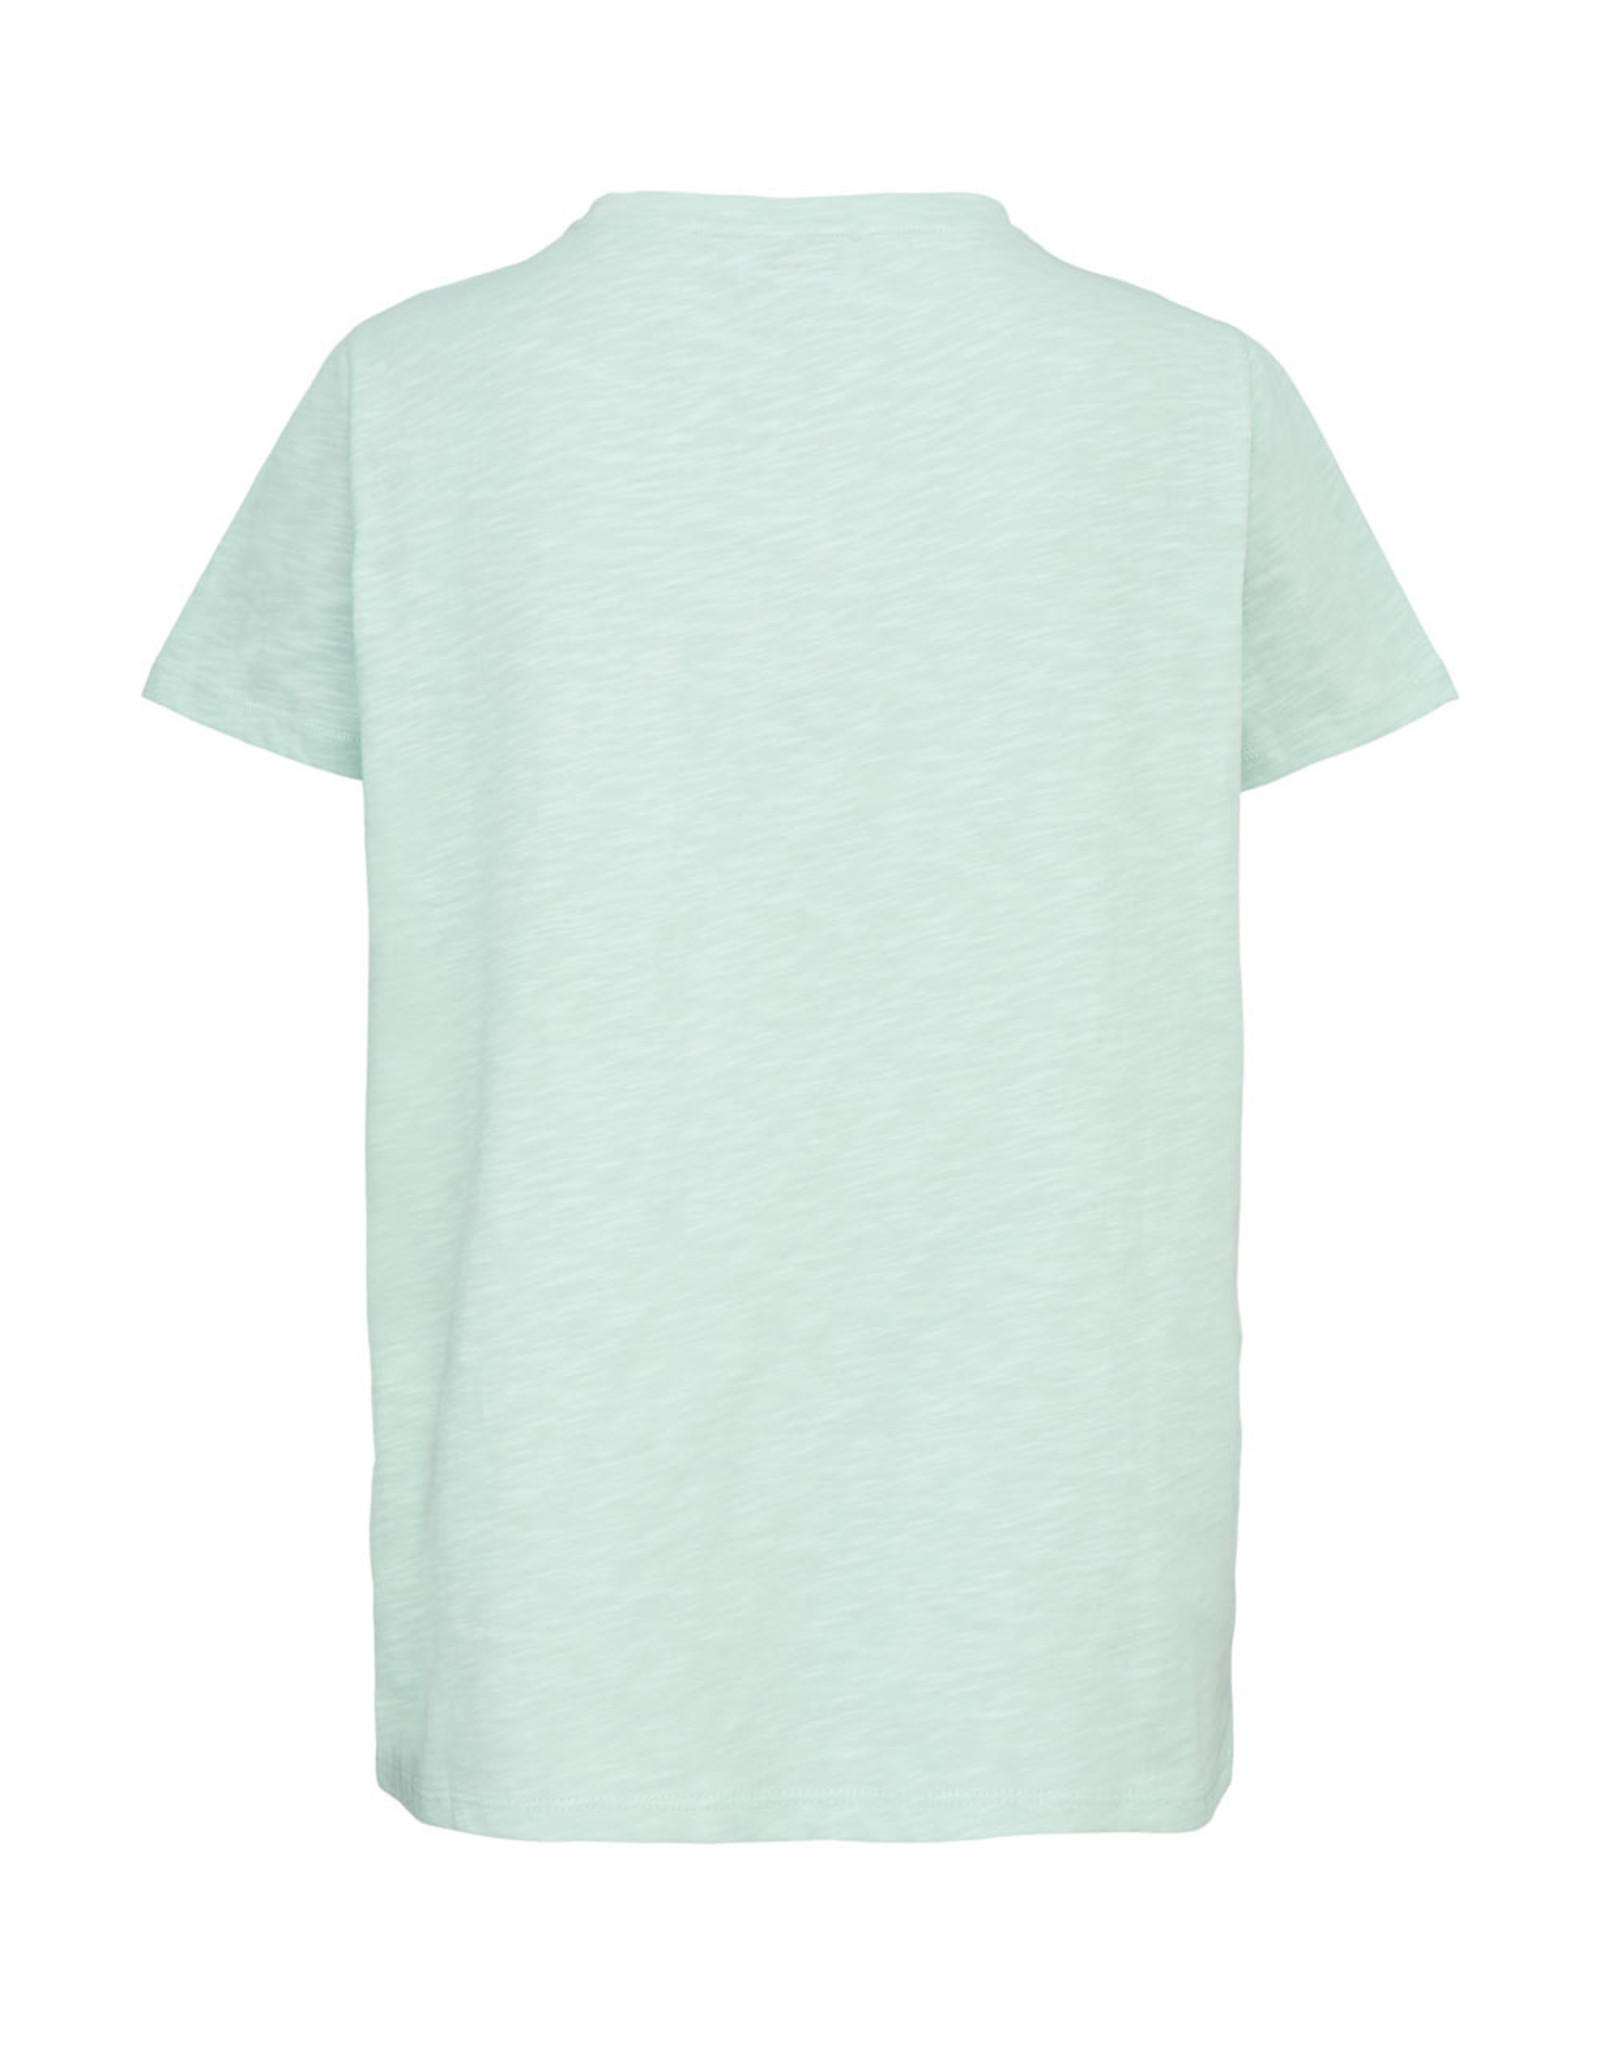 Modstrom Bridget T-Shirt Plain Air